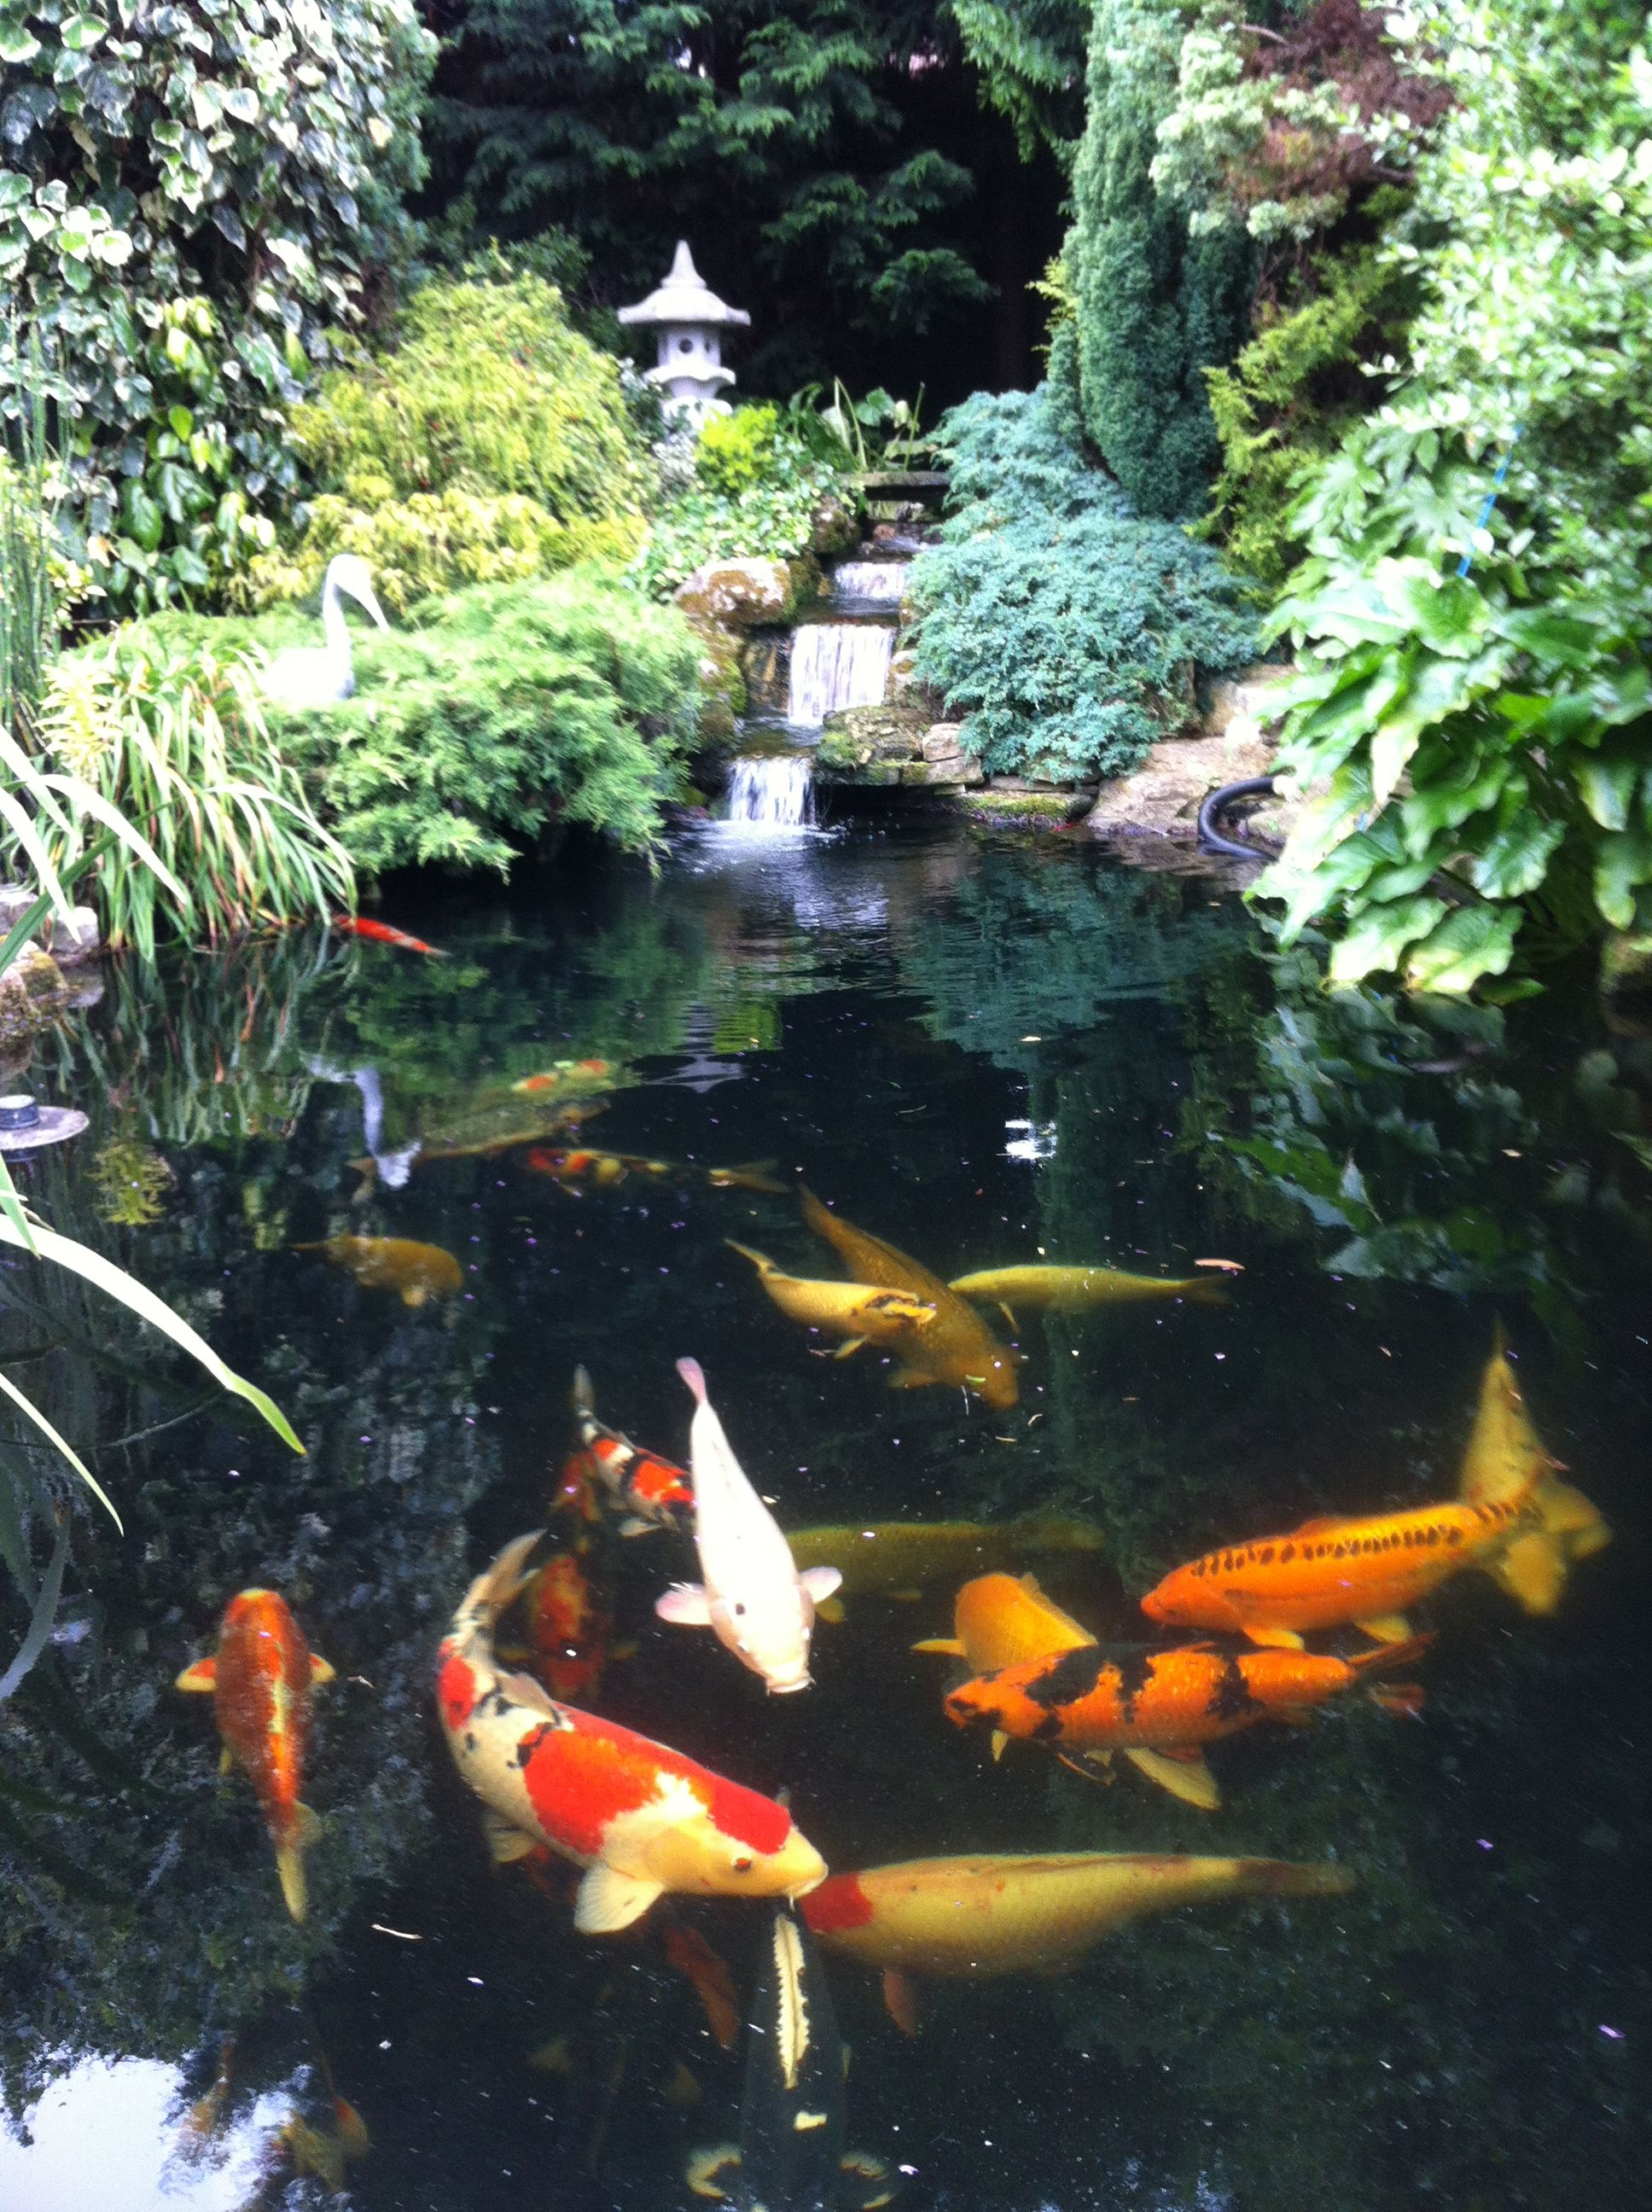 Koi carp pond | บ่อปลา+บ่อน้ำ | Pinterest | Koi carp, Koi and Pond